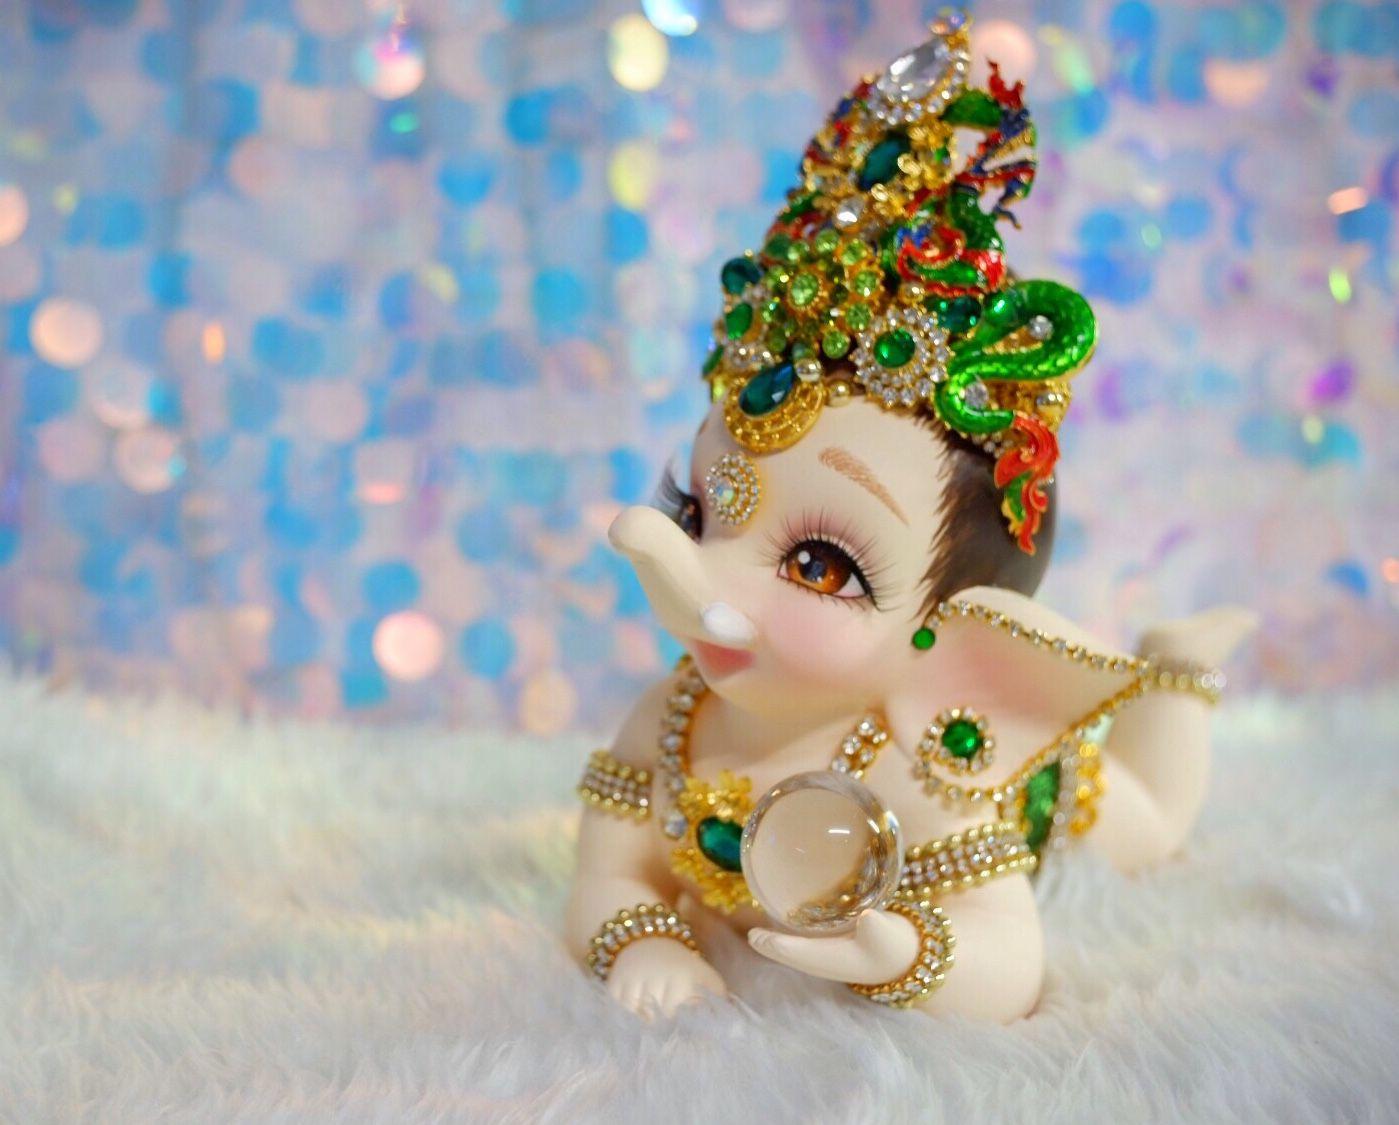 Pin By Sunil Varma On Gani Baby Ganesha Happy Ganesh Chaturthi Images Ganesh Chaturthi Images Beautiful cute baby ganesha wallpaper hd